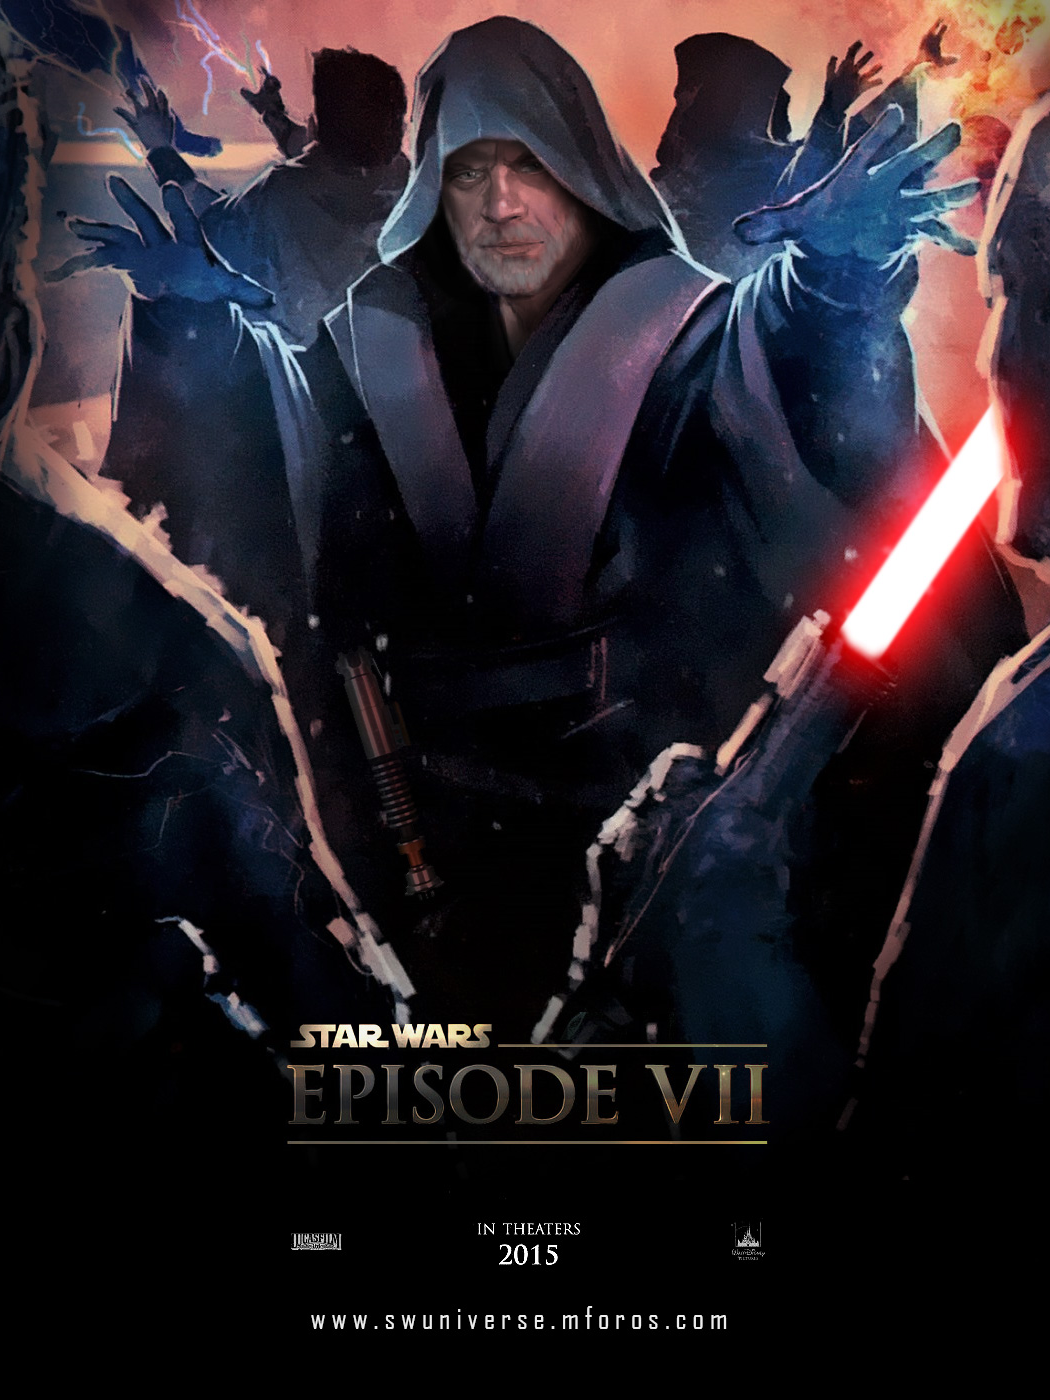 Star Wars Episode VII Fan Poster by DarthTemoc